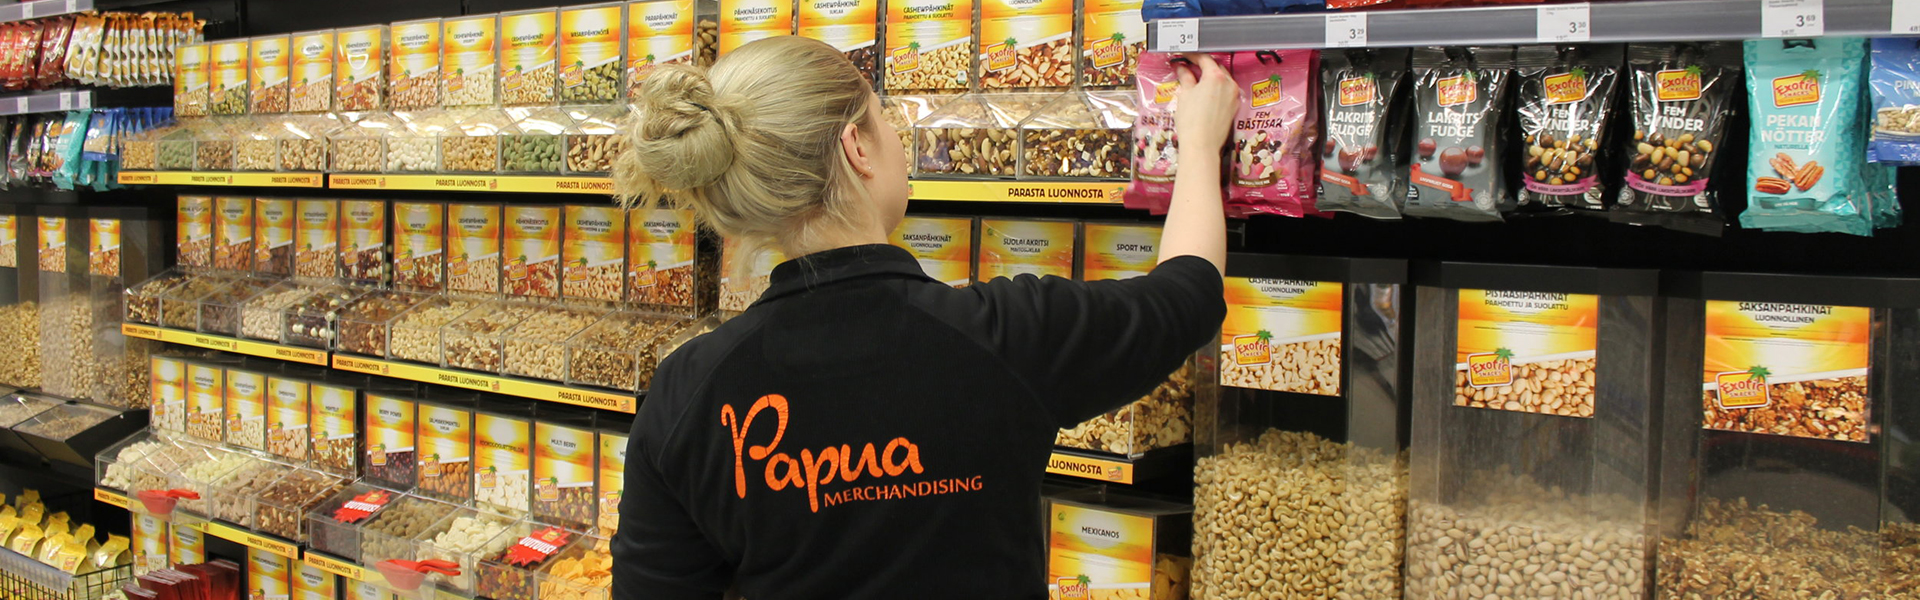 Papua - Papua Merchandising Oy 4608c04f6f